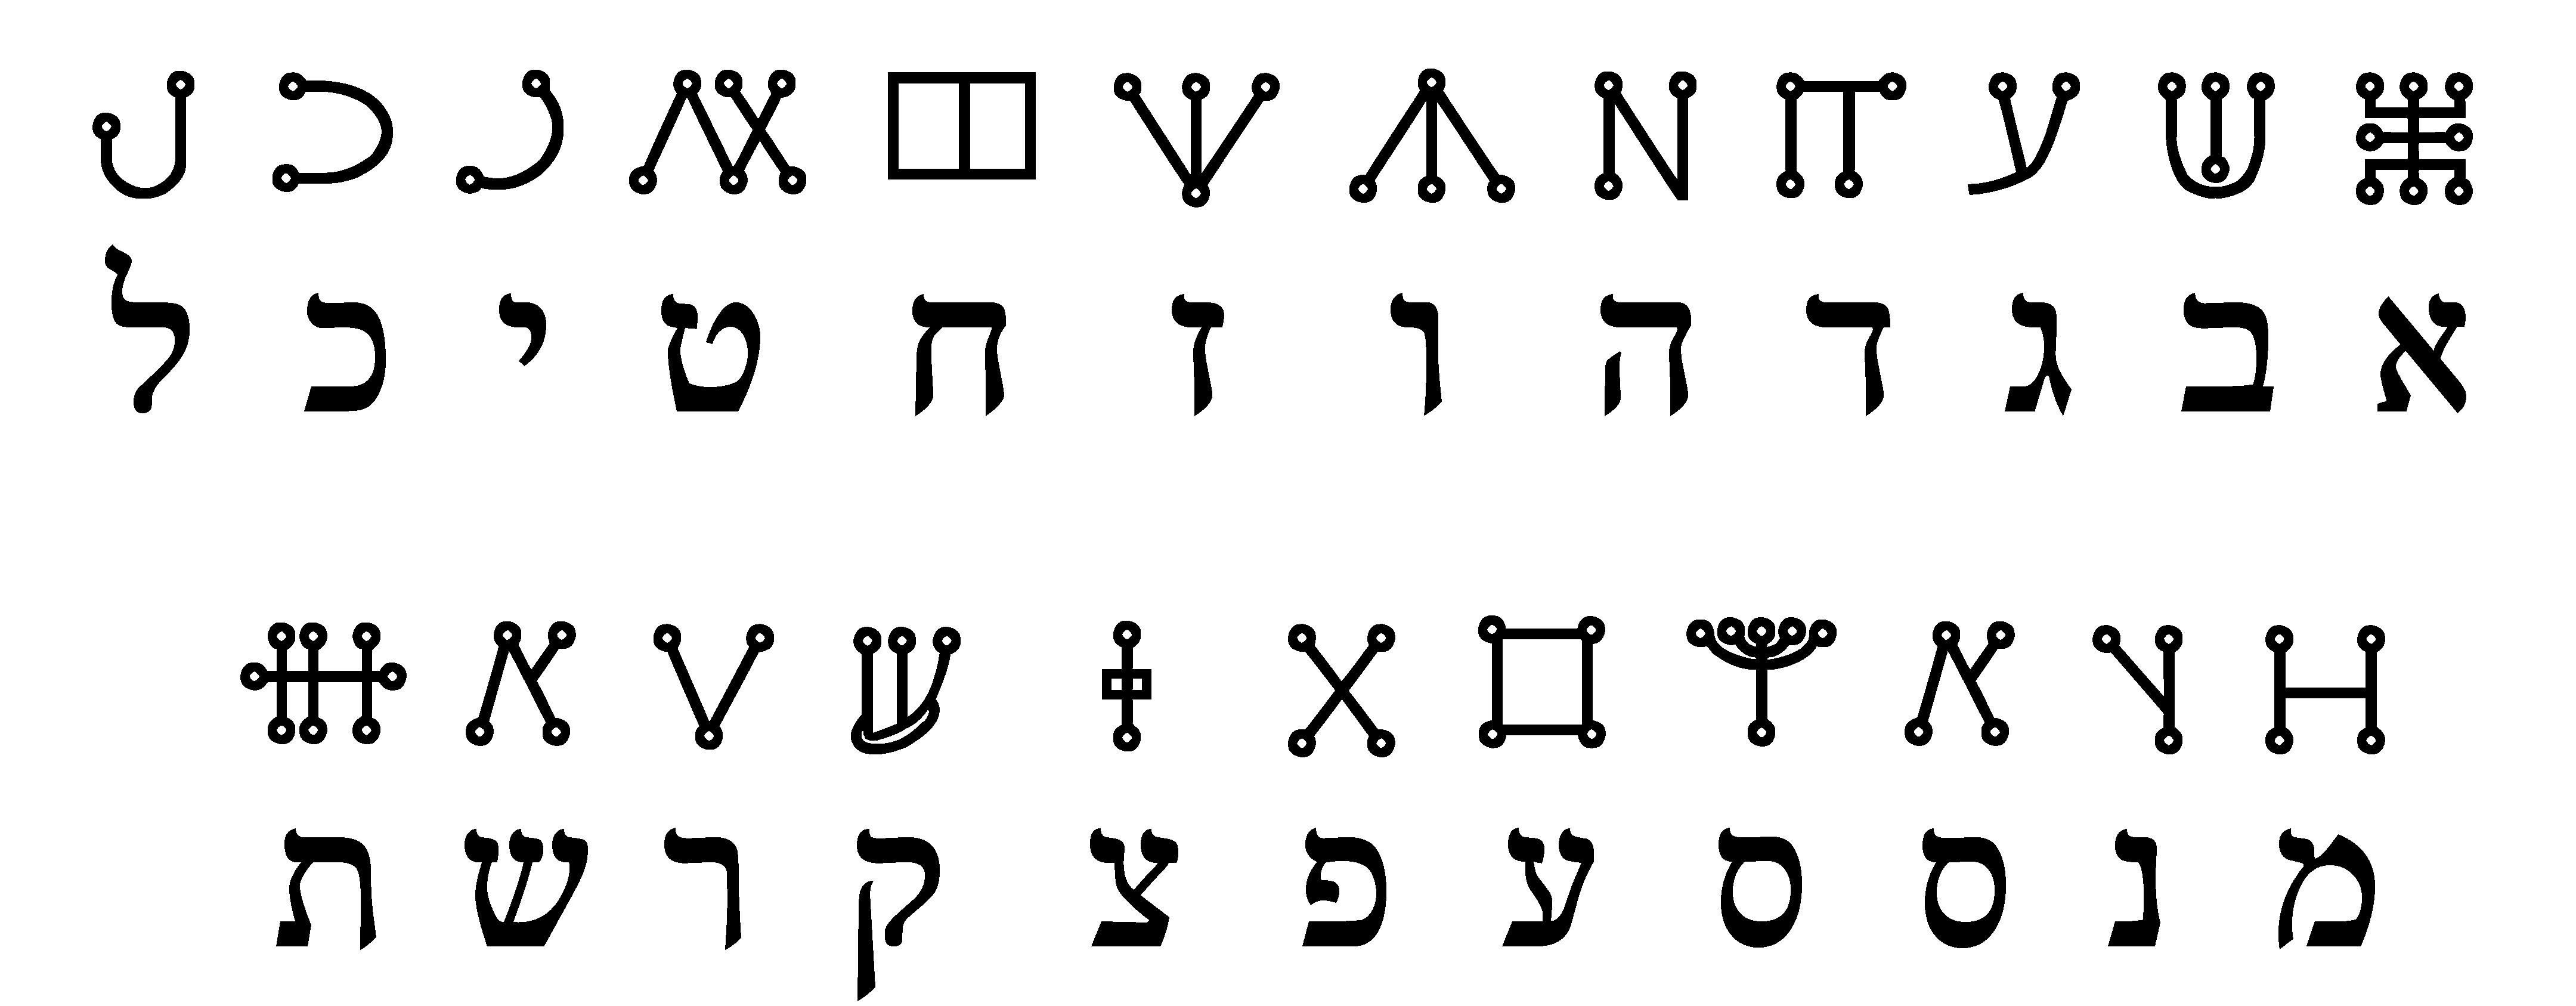 malachim writing from agrippa de occulta philosophia iii